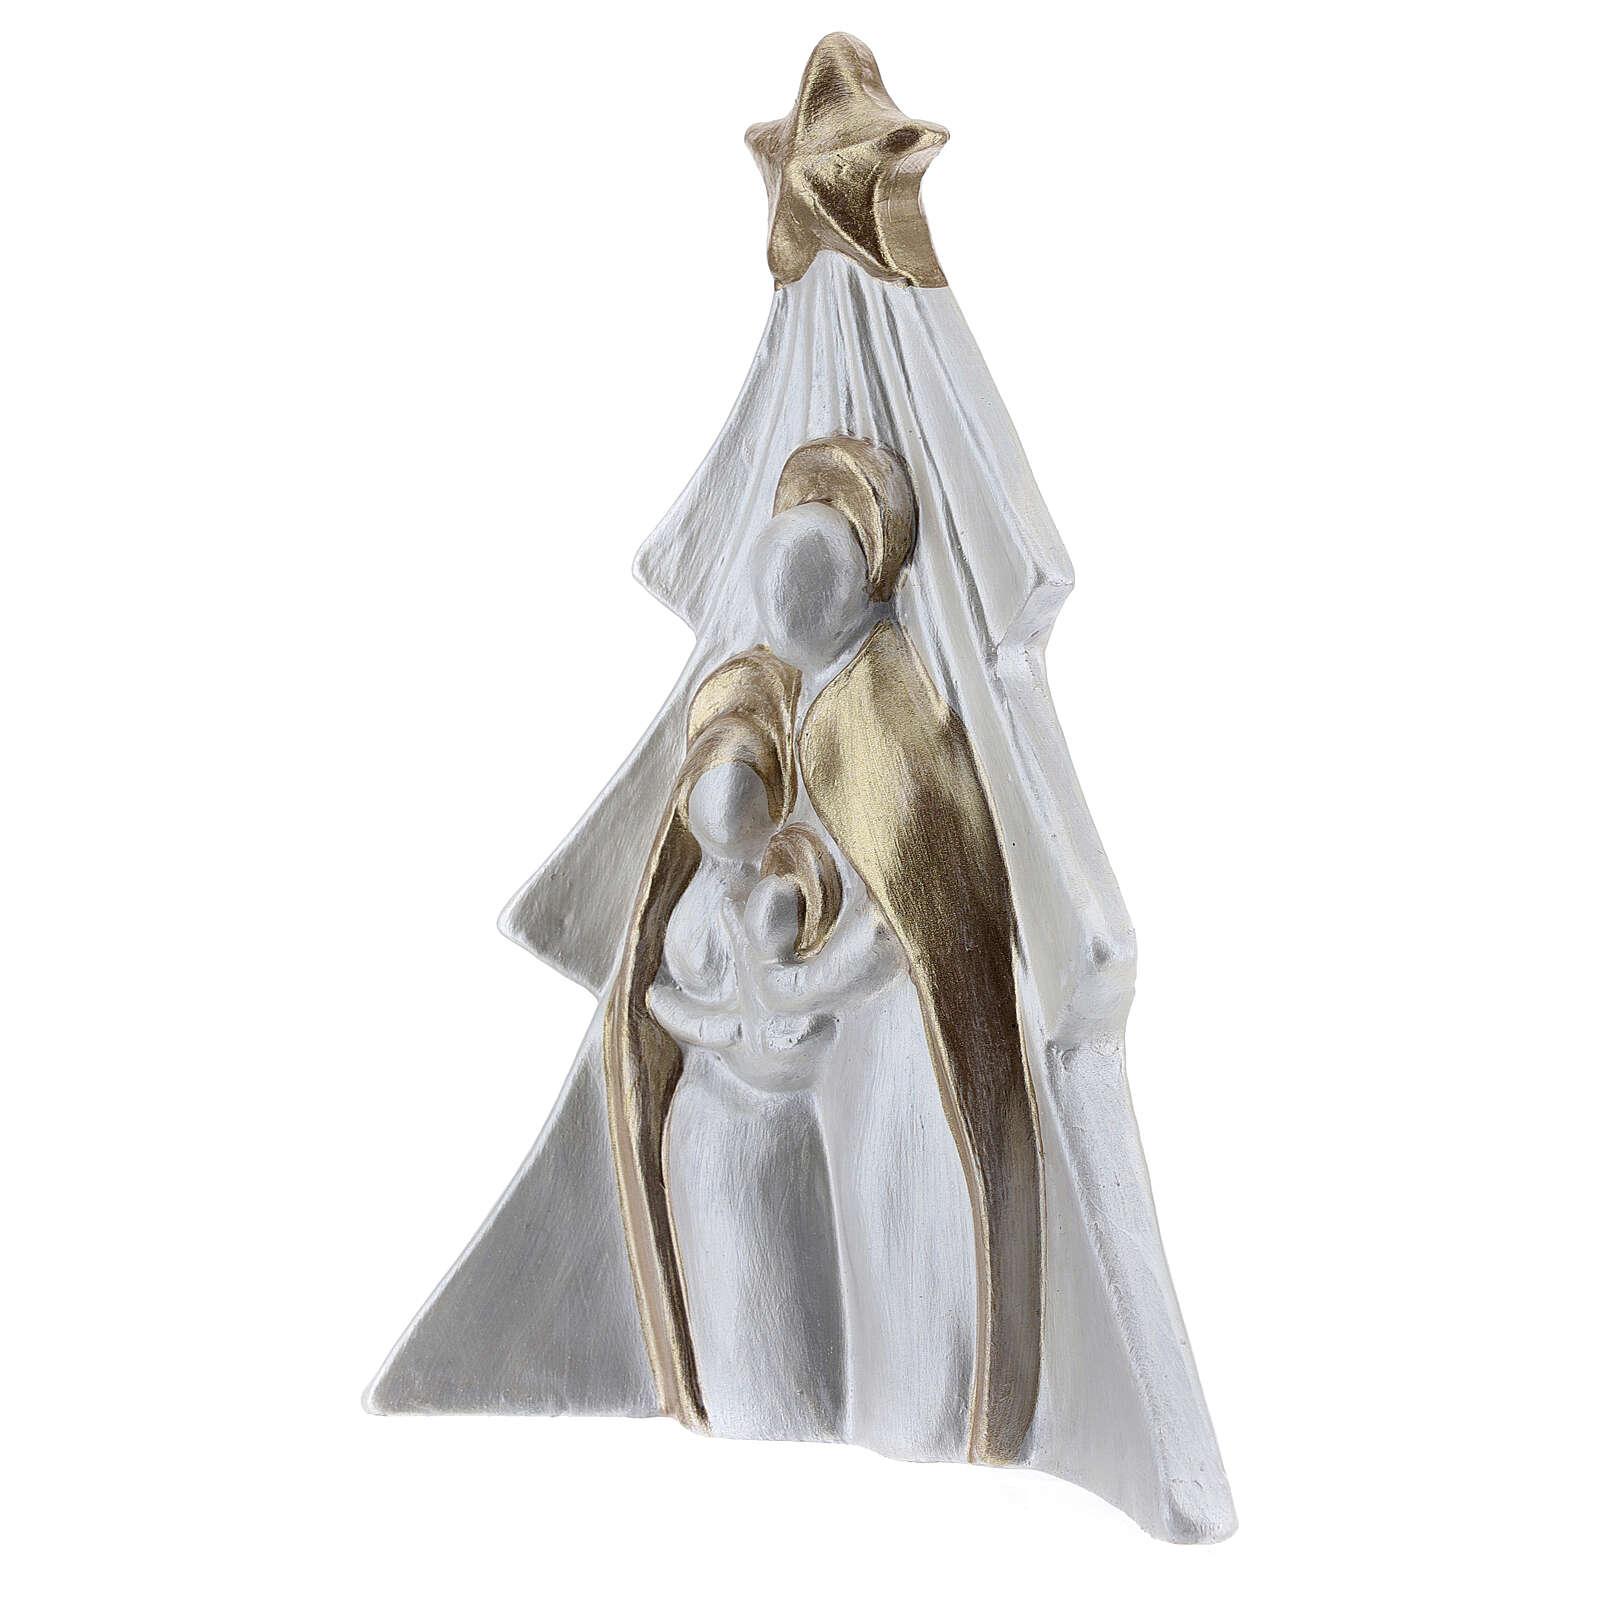 Sacra Famiglia albero terracotta Deruta bianco oro 19x16 cm 4